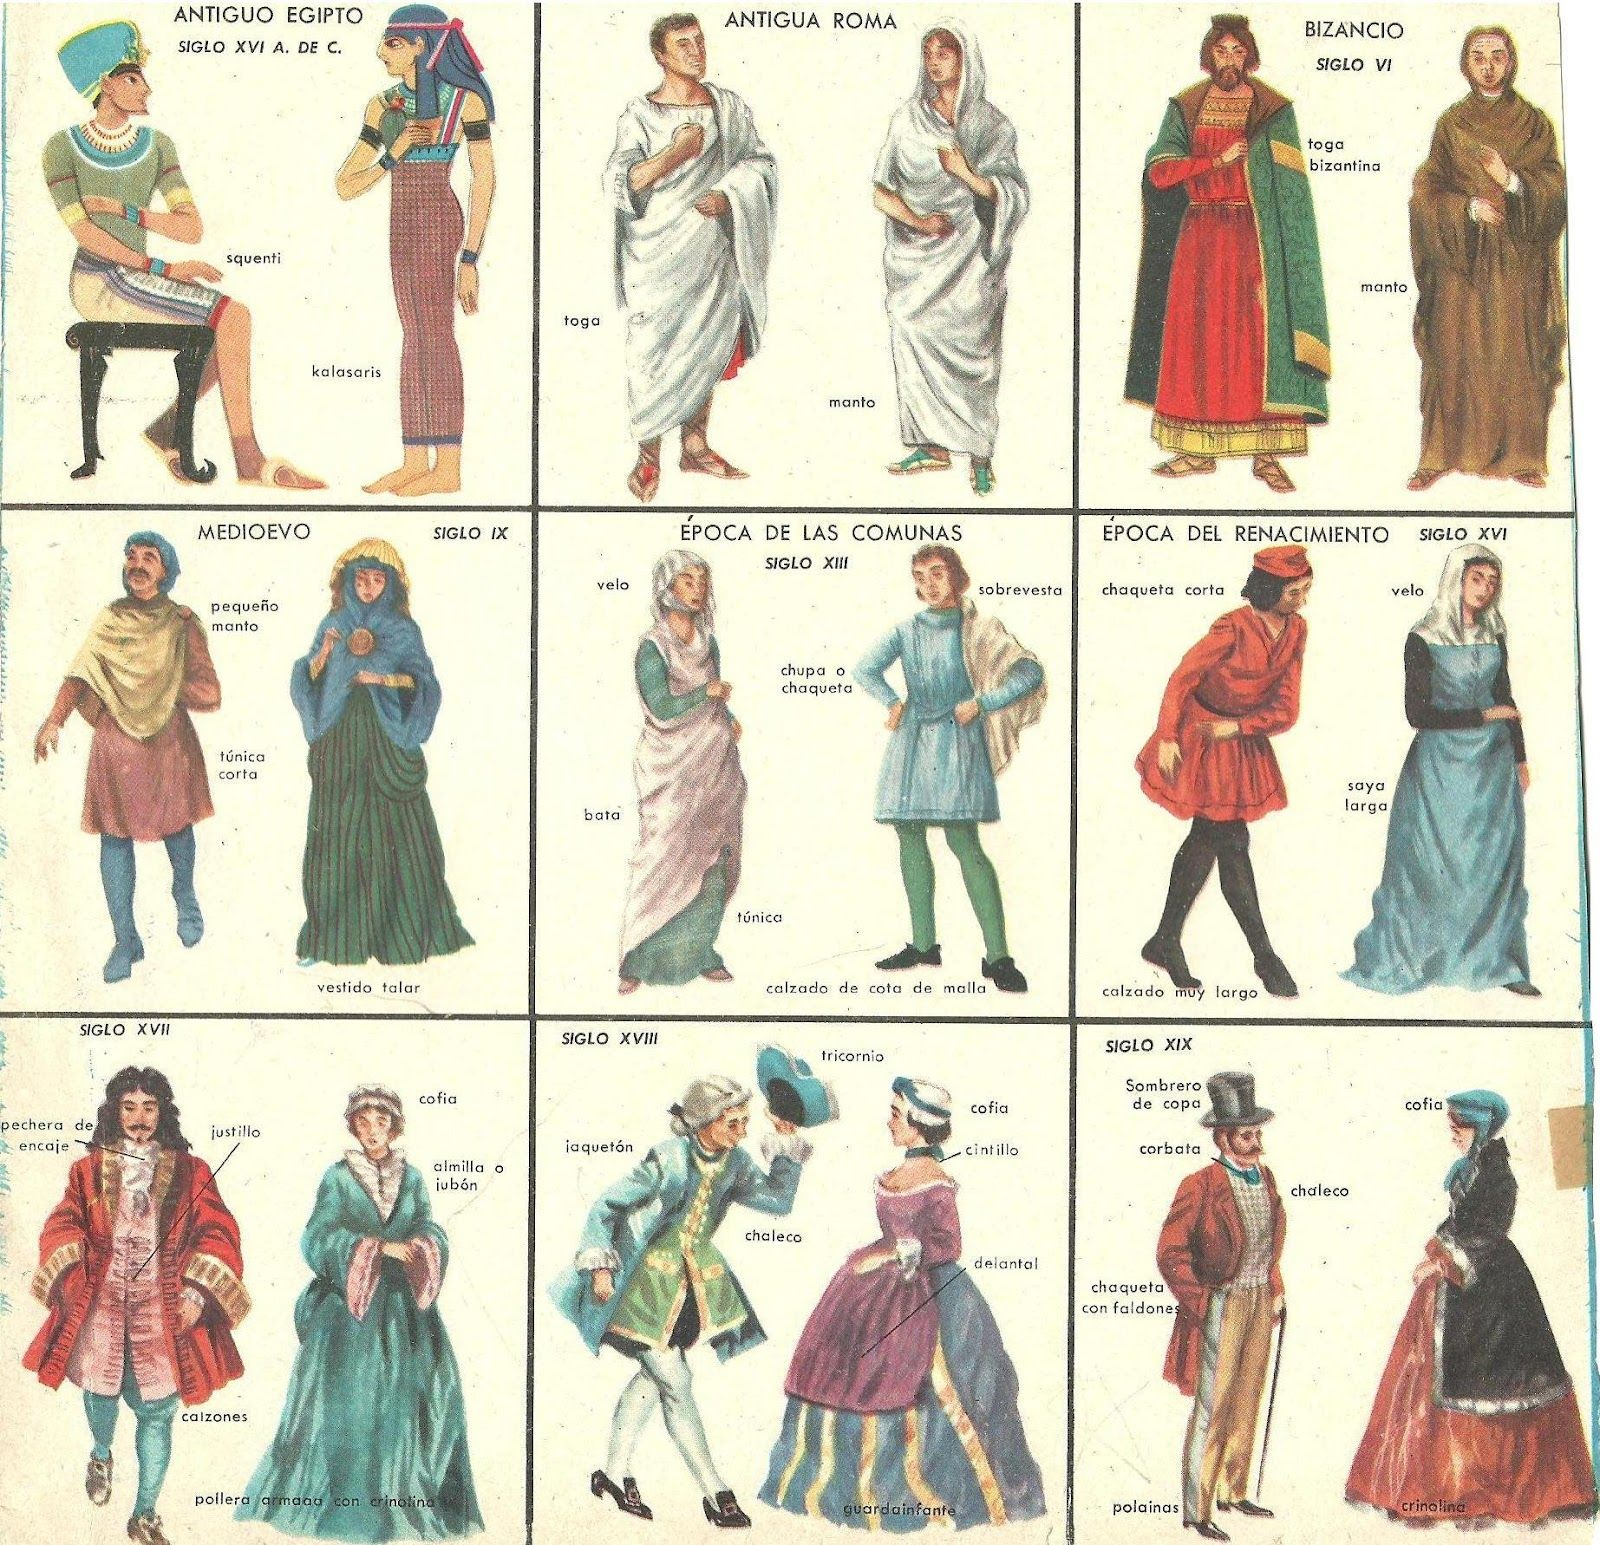 Historia a través del vestido